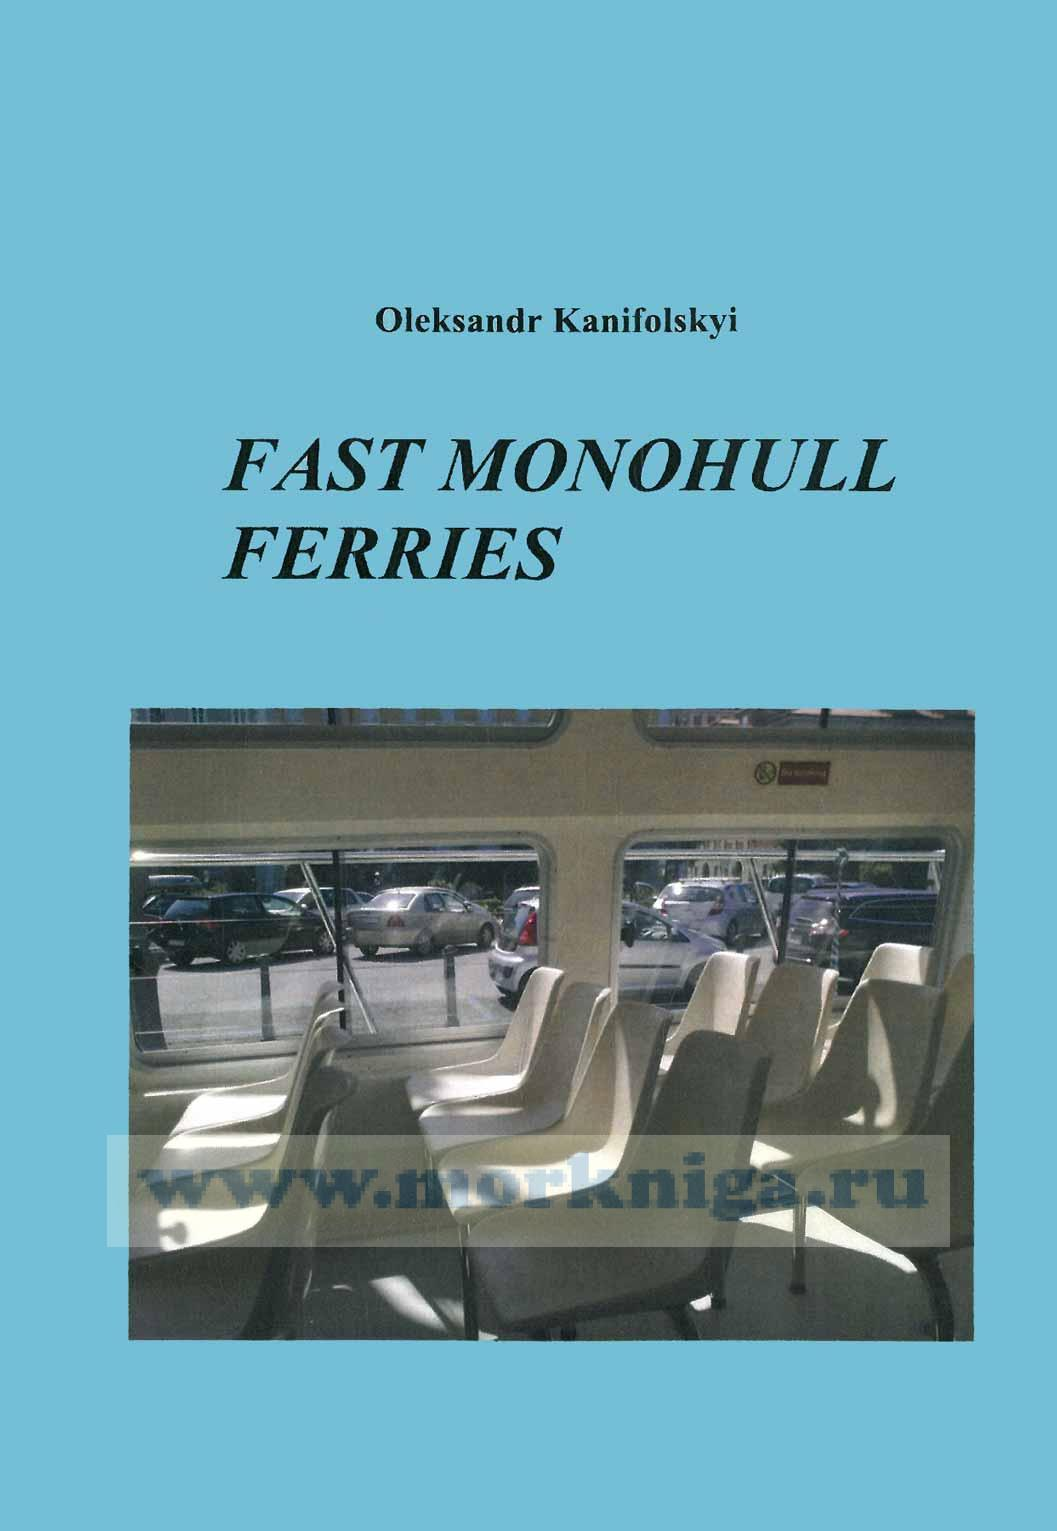 Fast monohull ferries